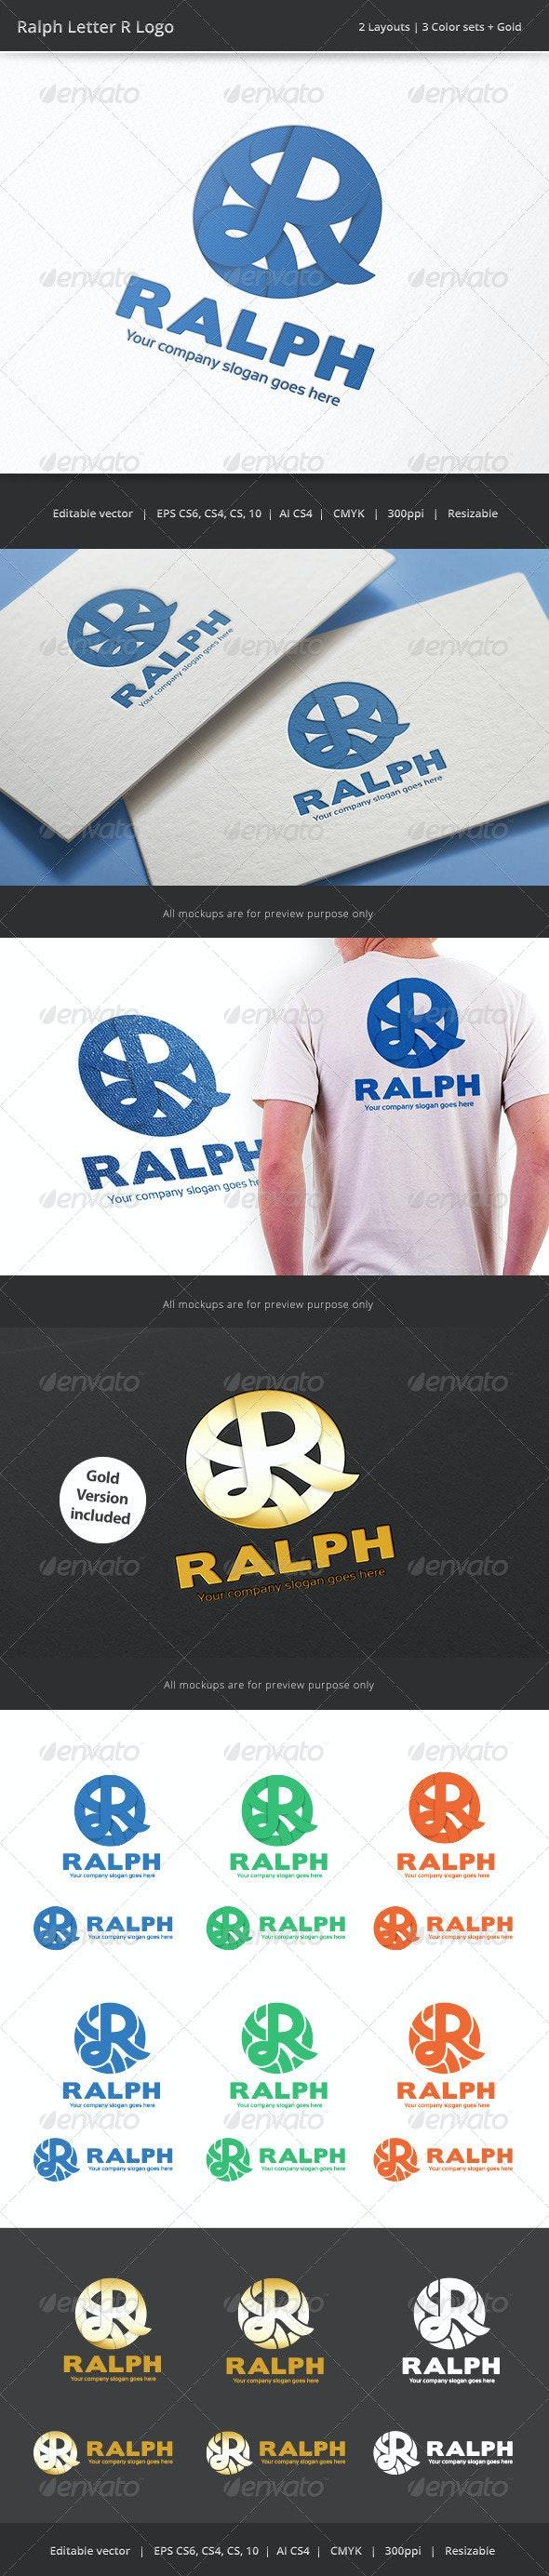 Ralph Letter R Logo - Letters Logo Templates